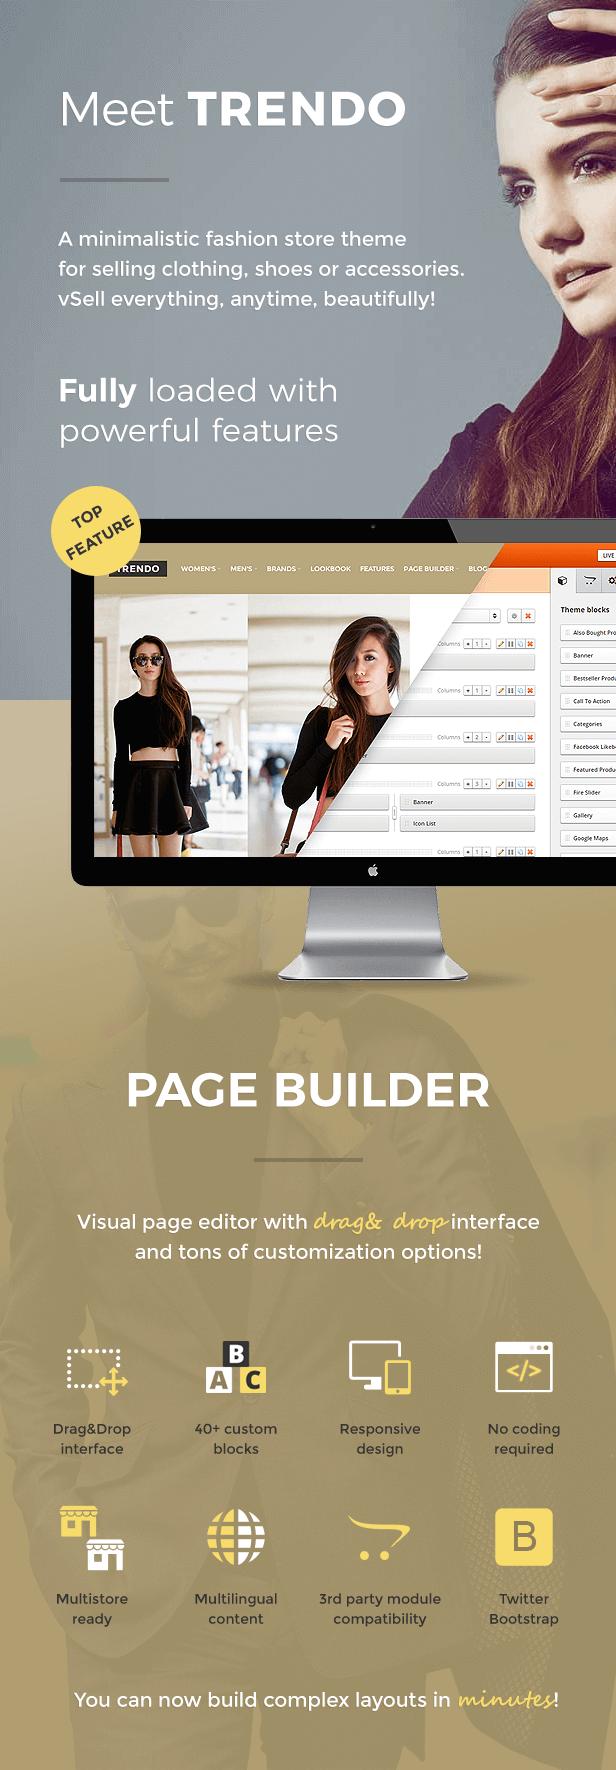 Trendo - Minimalist Moda Mağazası OpenCart Teması - 7